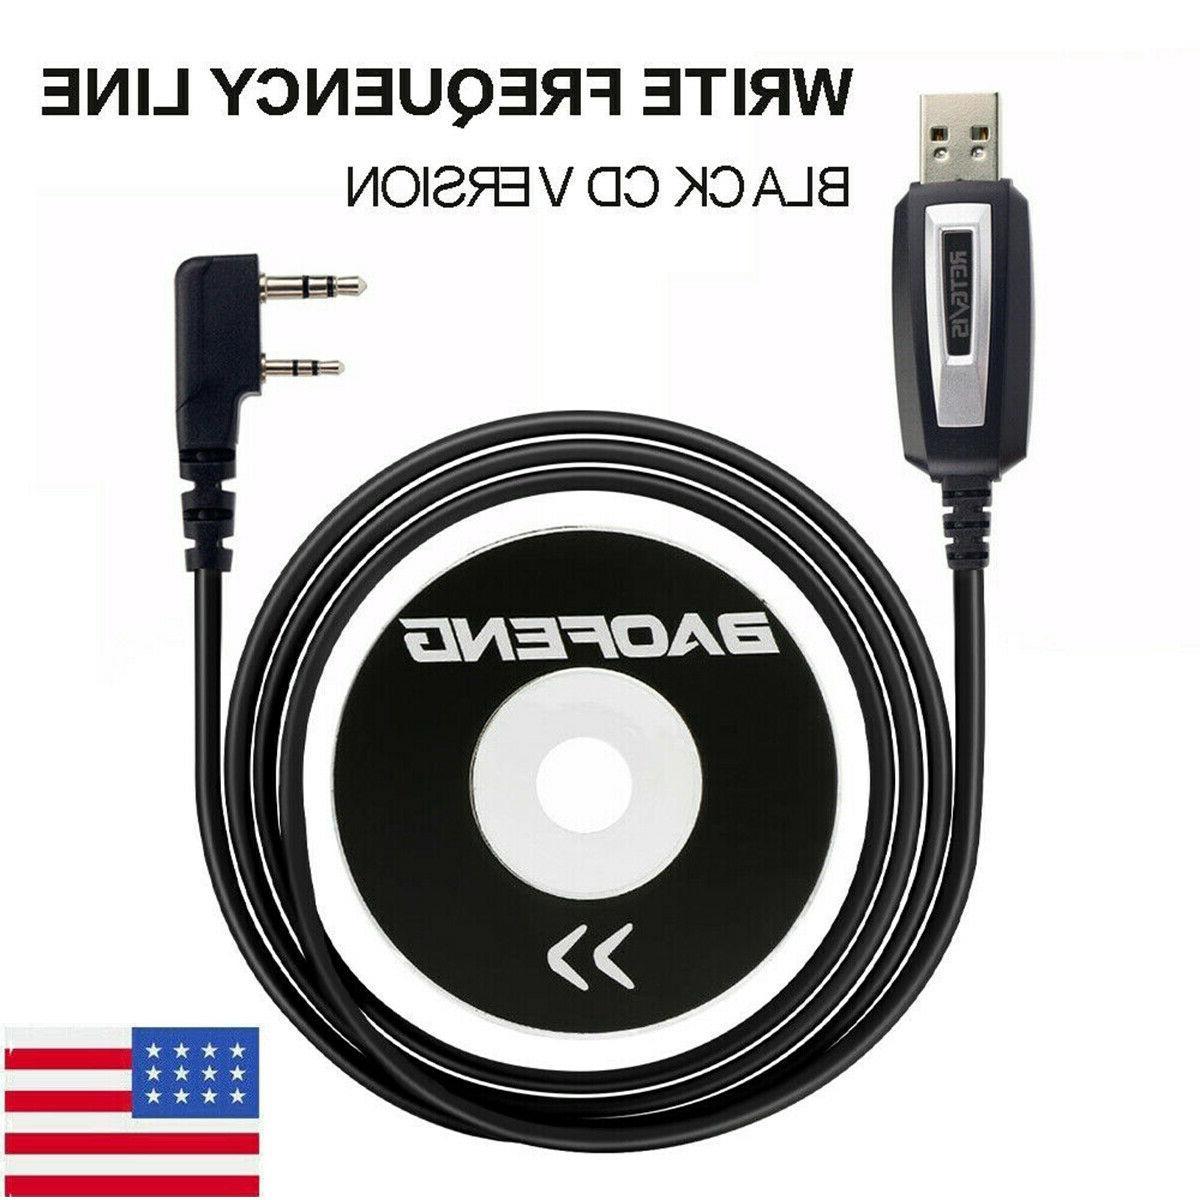 programming cable 2 pin usb software cd